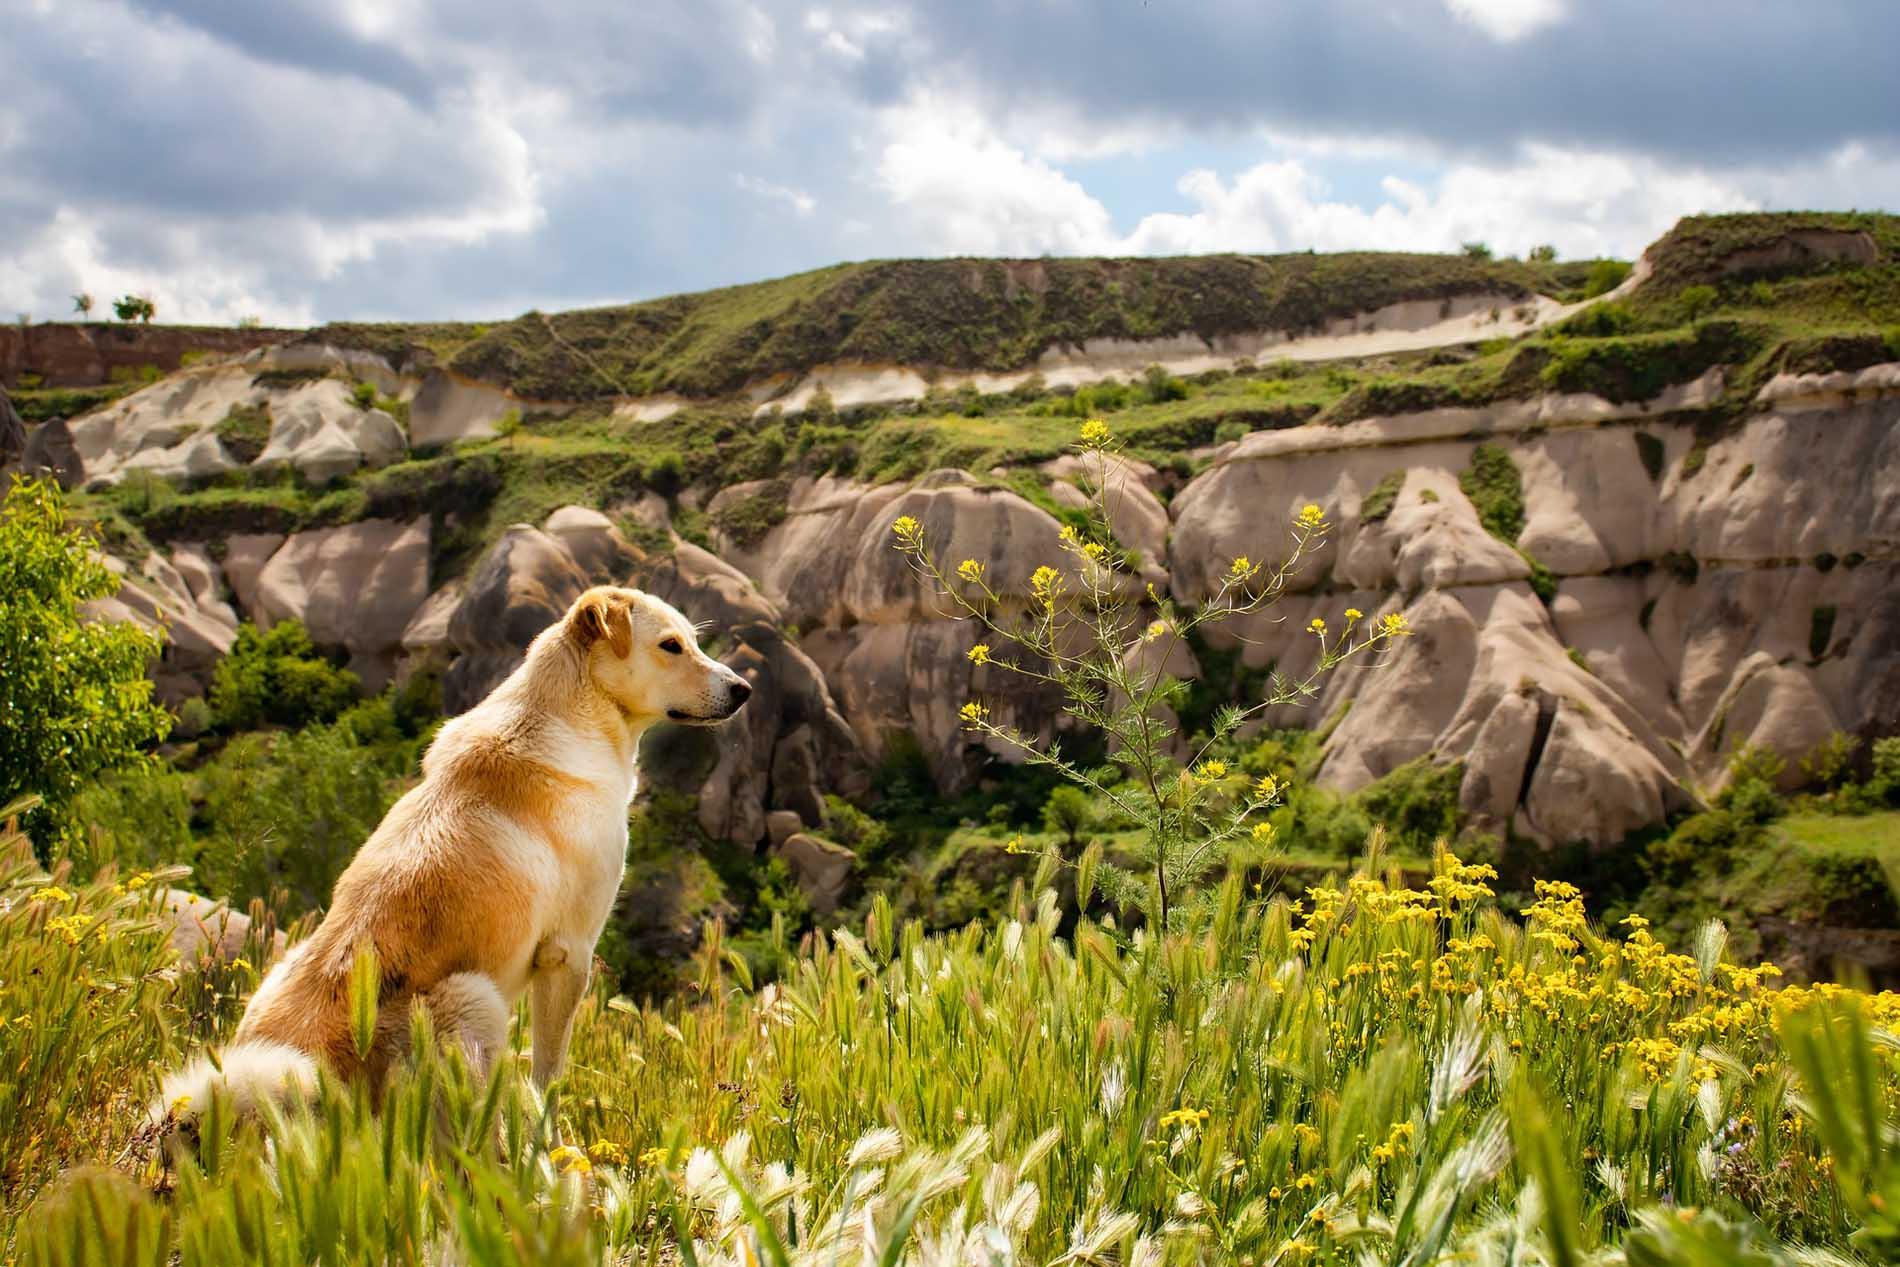 Golden Retriever sitting grass looking over a canyon.